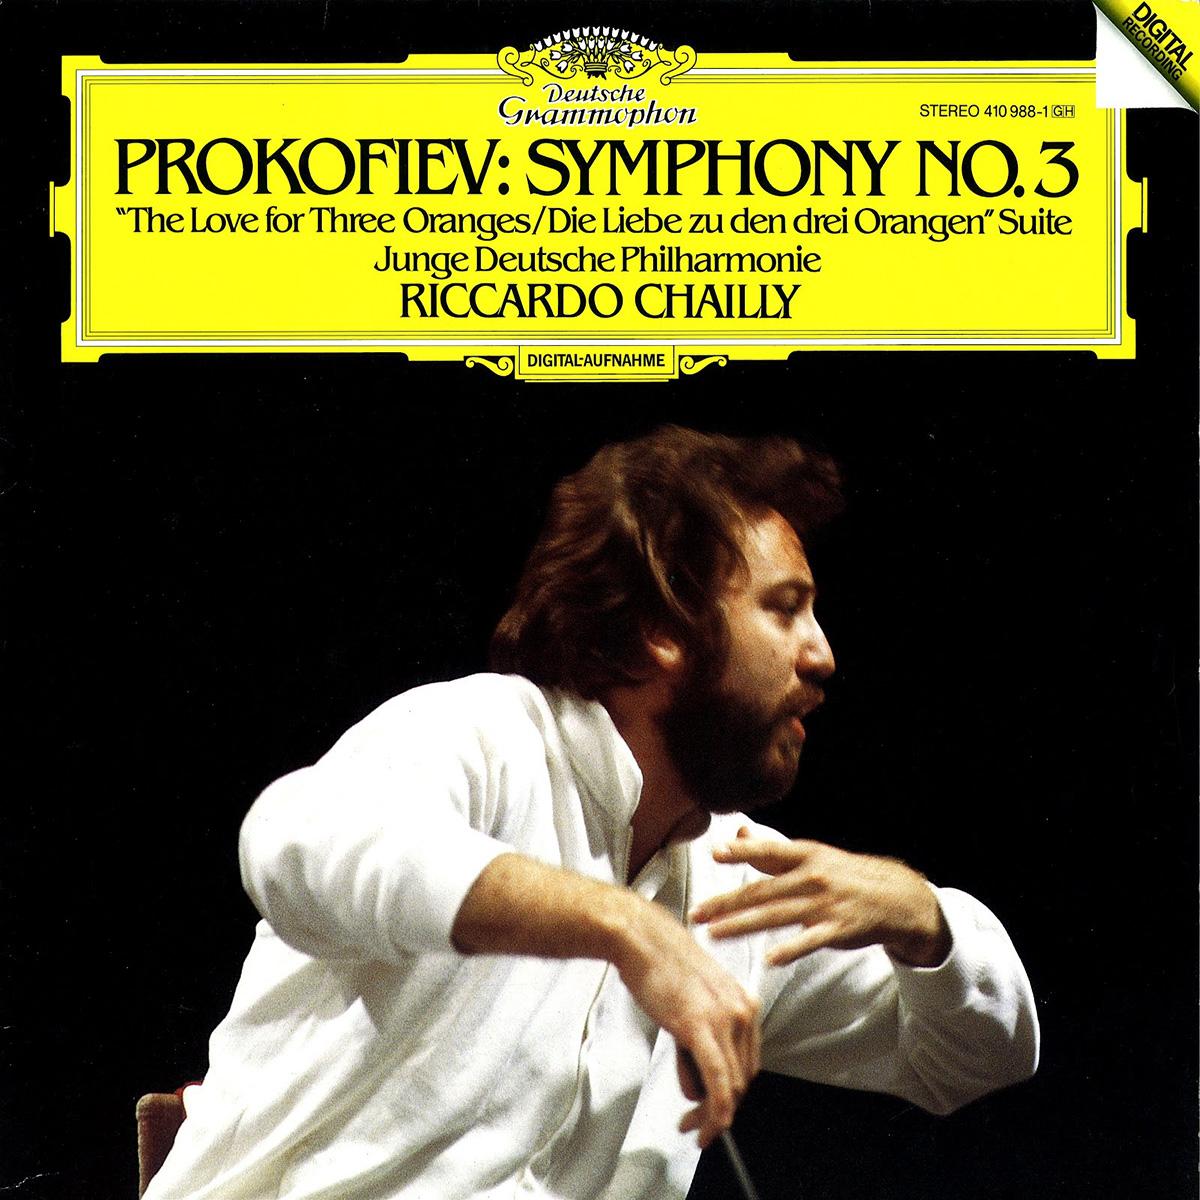 DGG 410 988 Prokofiev Symphonie 3 Chailly DGG Digital Aufnahme